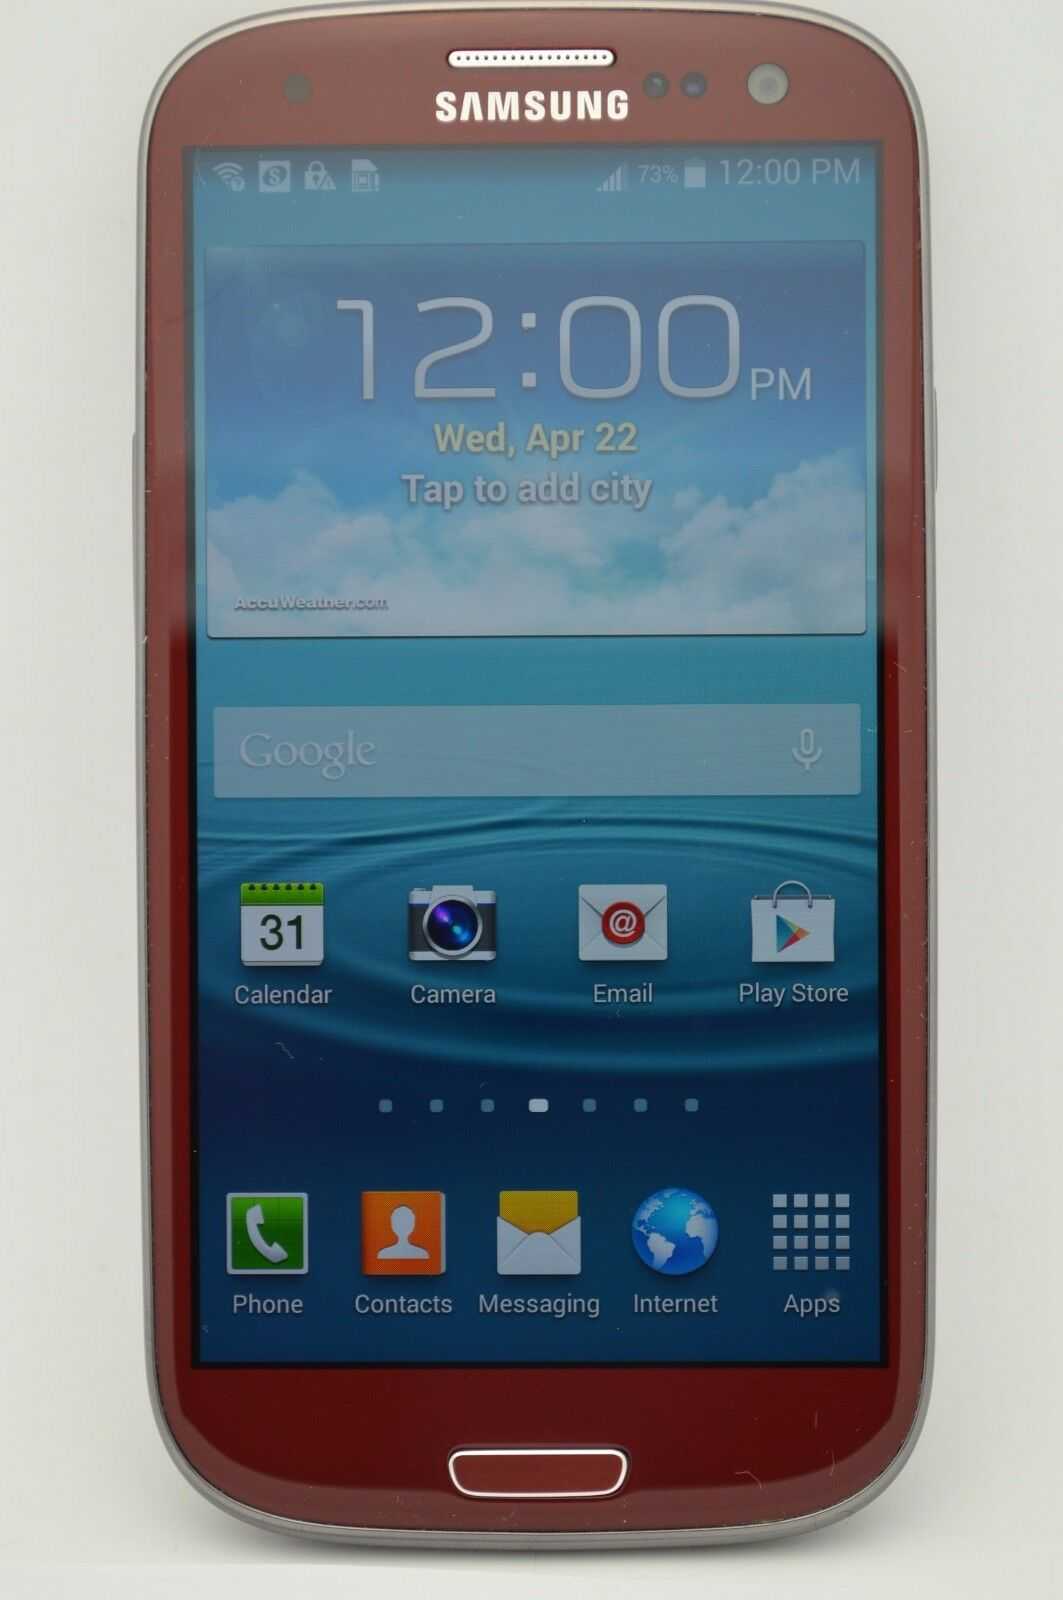 This Samsung Galaxy On5 GT1 8GB Metro PCS GSM Unlocked Smartphone is Samsung Galaxy J3 Pro () JF/DS 16GB Gold, 5